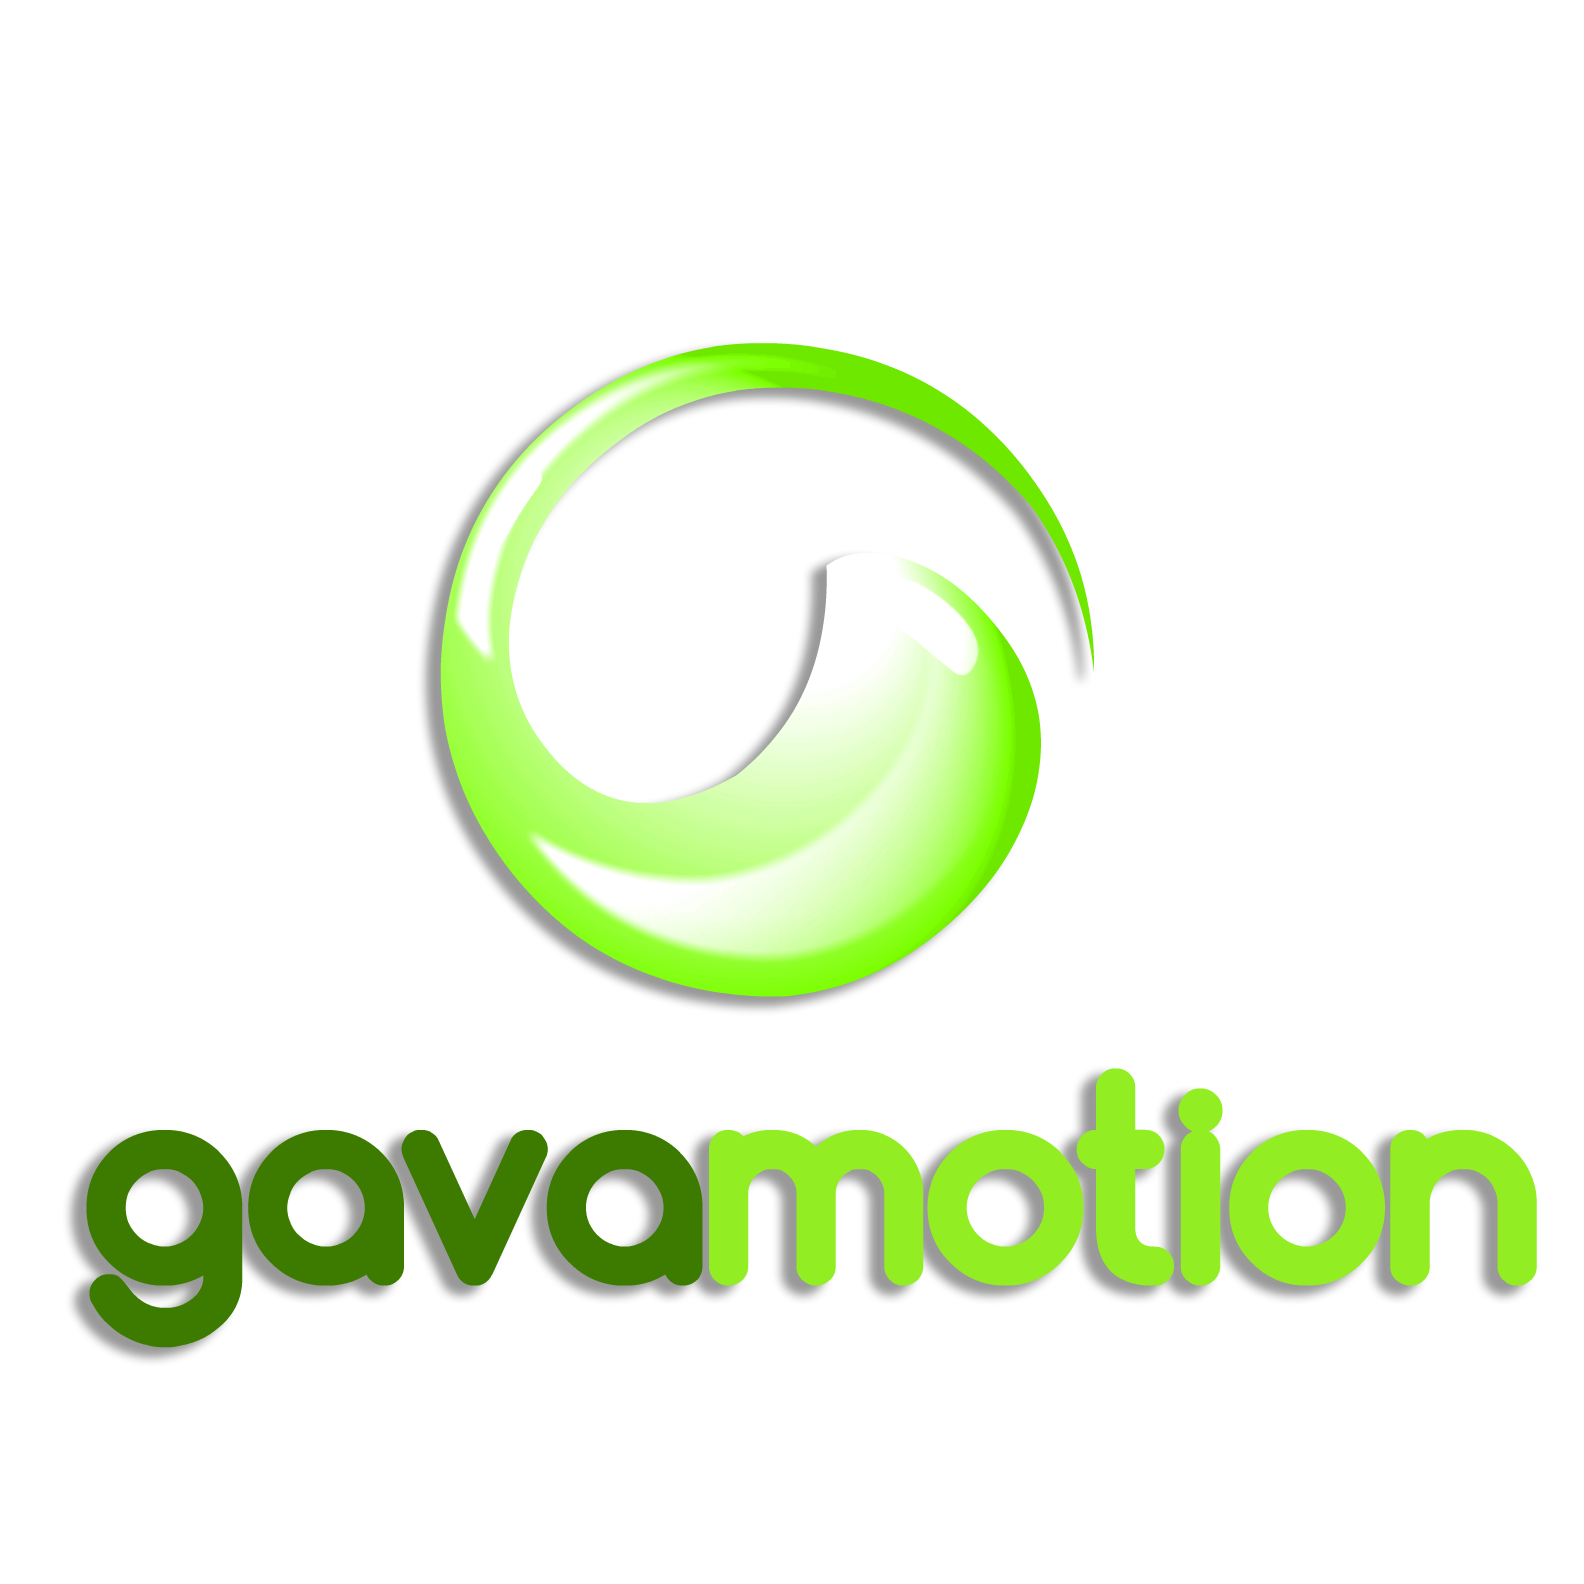 GavaLogogreen.png